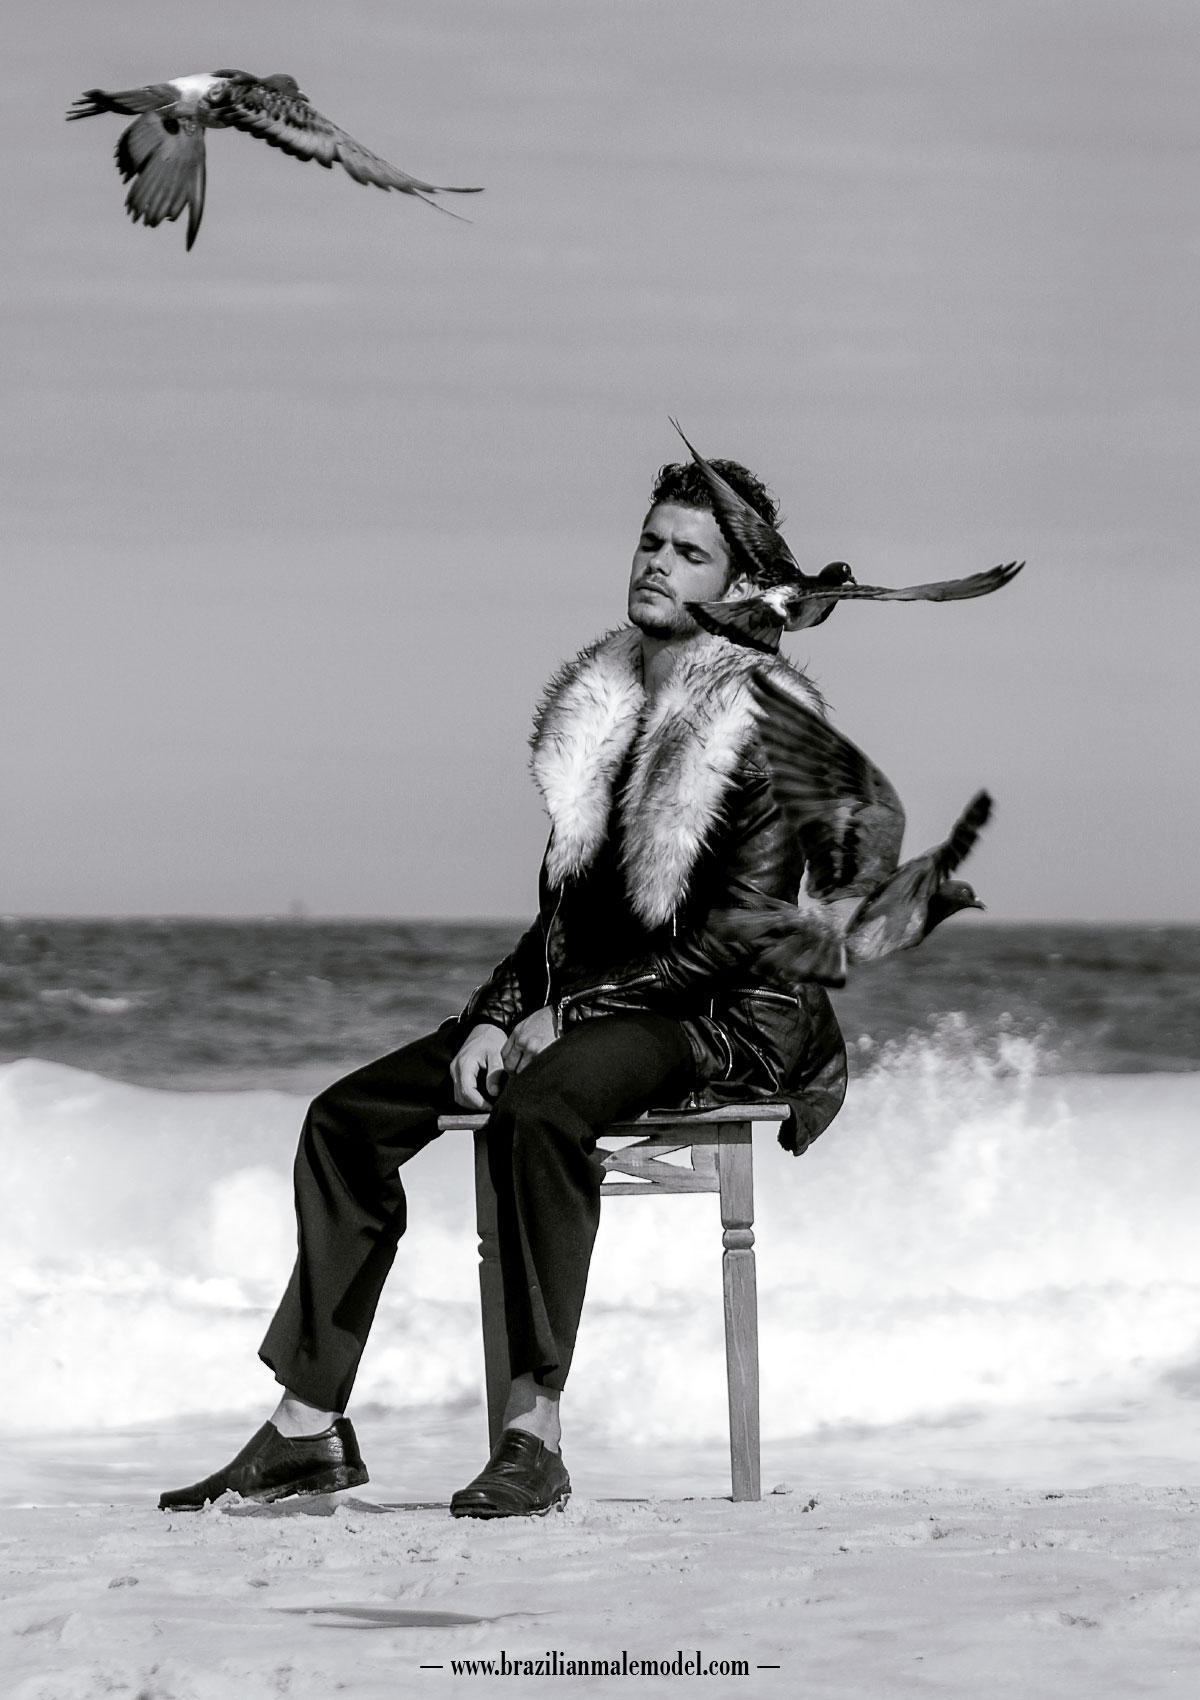 Johan Bruinsma by Marcio Farias for Brazilian Male Model Magazine#2